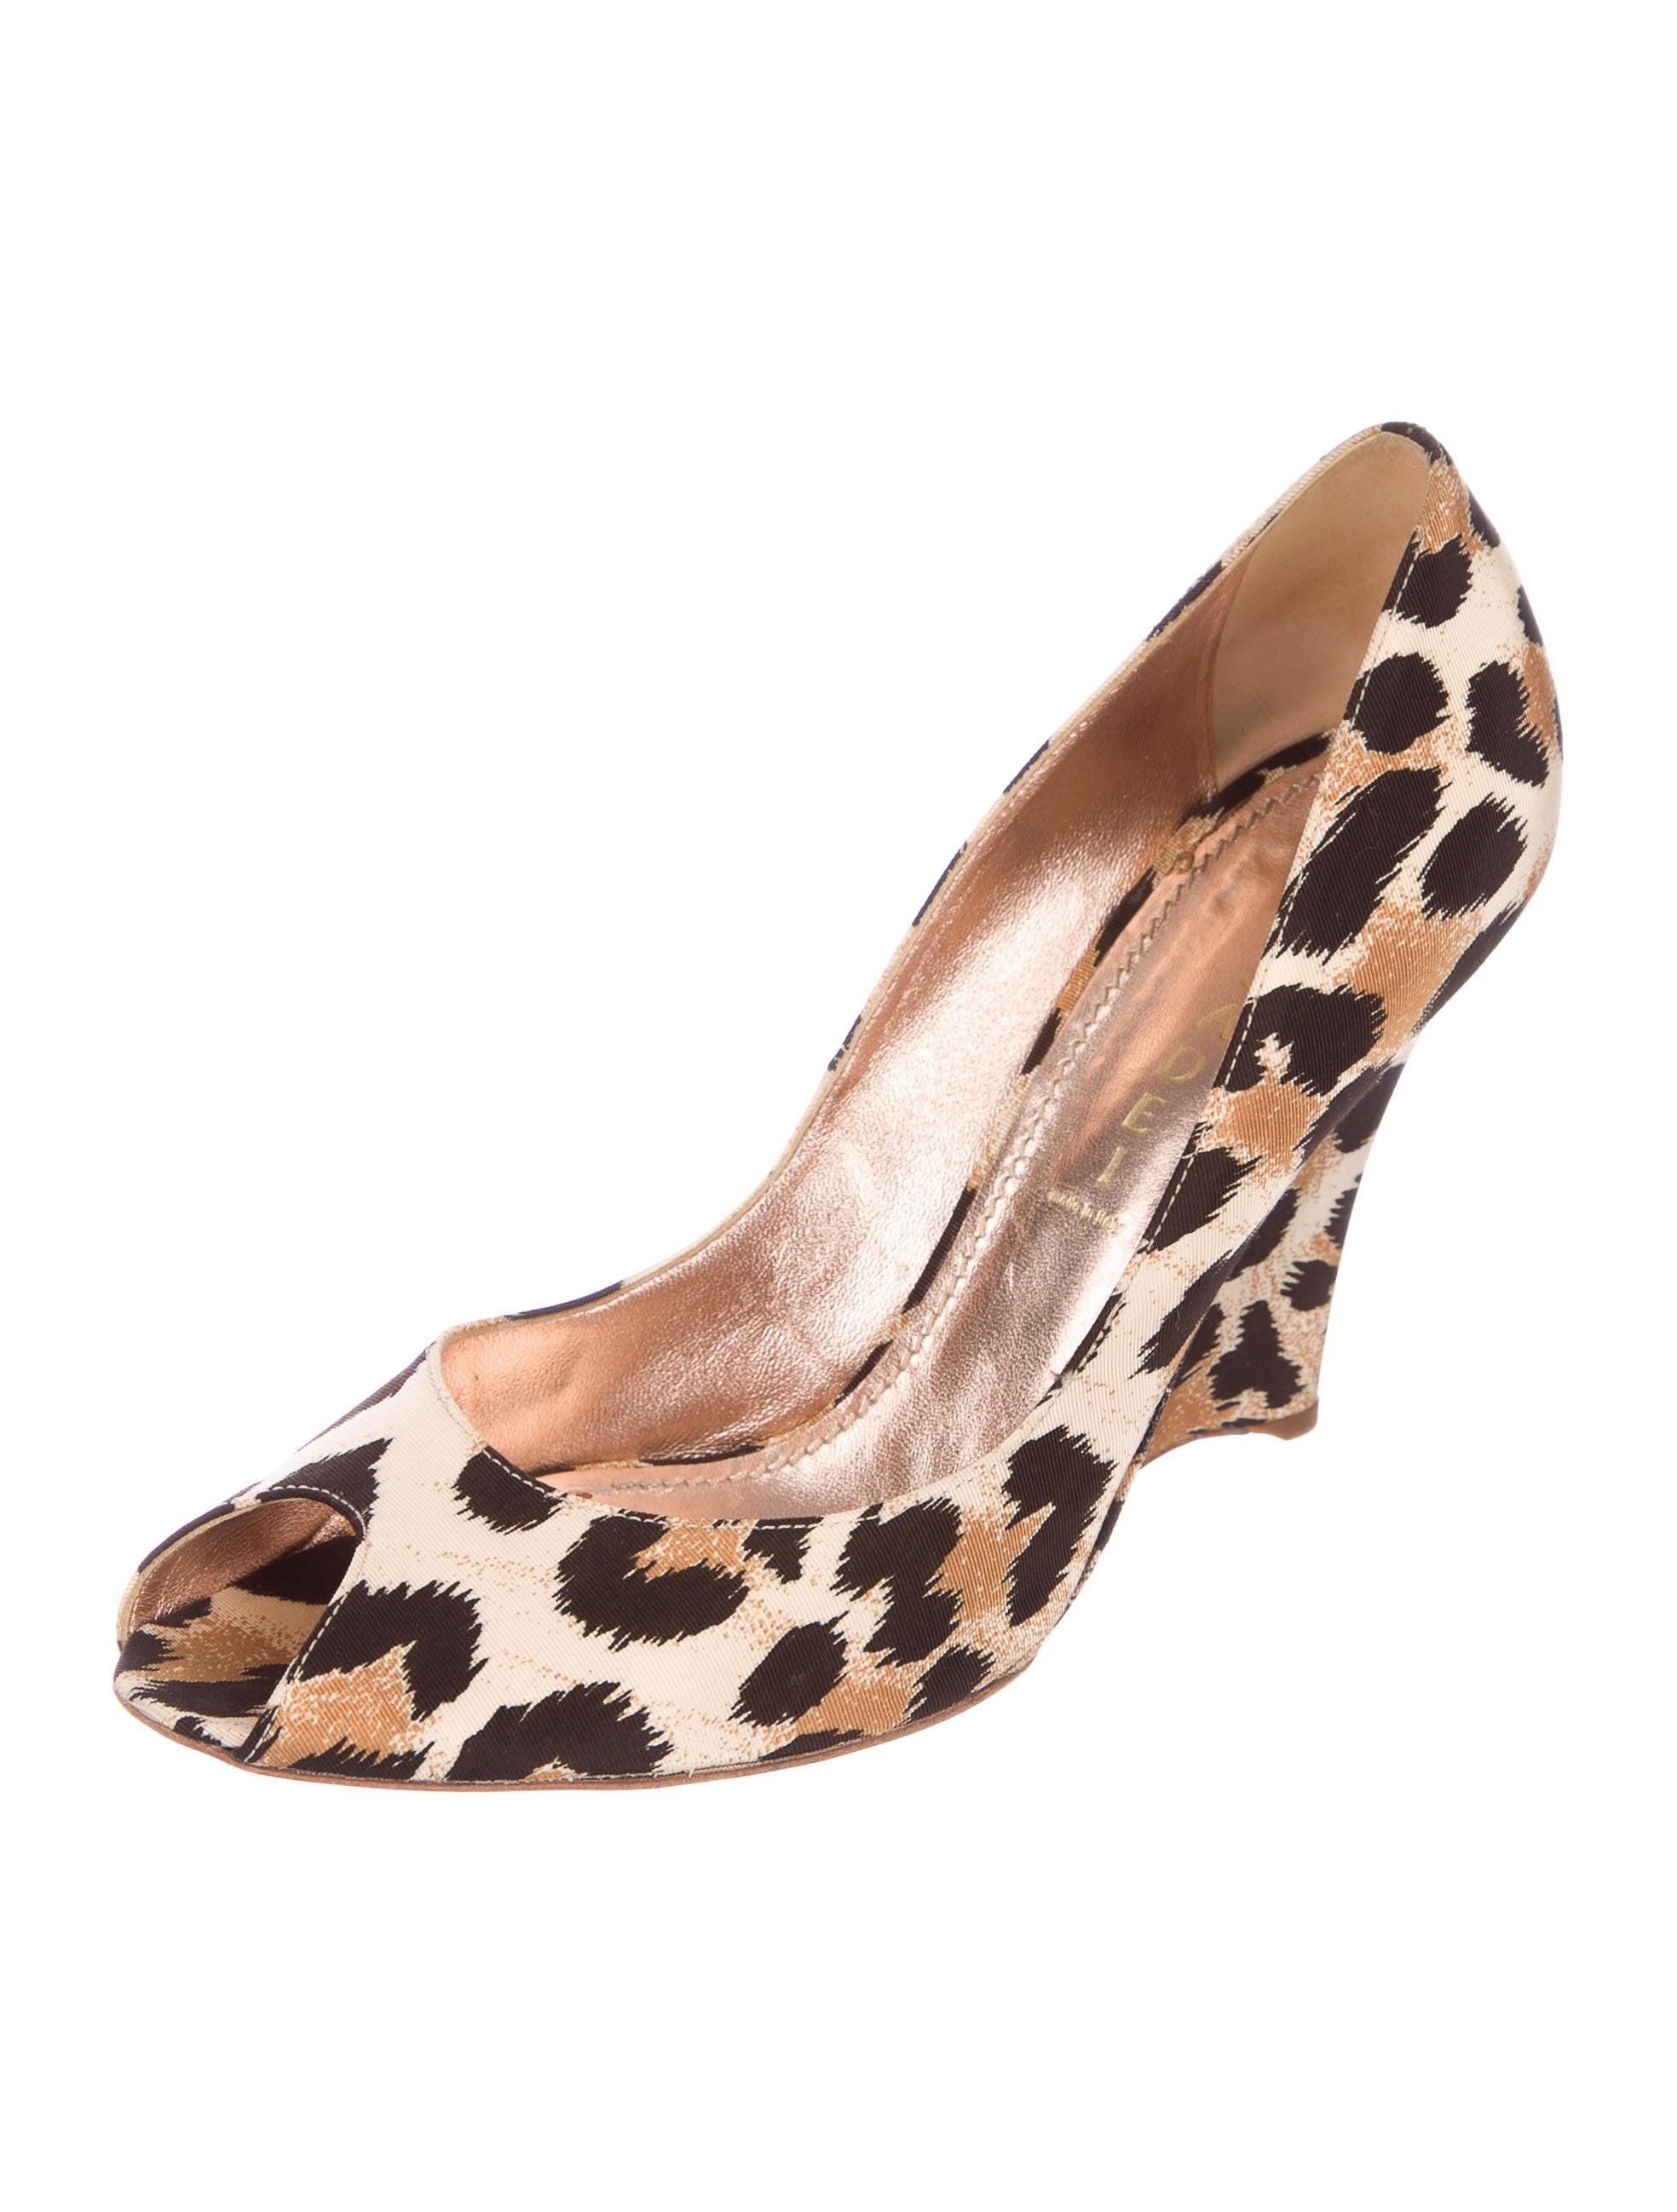 clearance marketable Casadei Satin Leopard Peep-Toe Wedges clearance collections cheap online shop hVzrr6J3Q